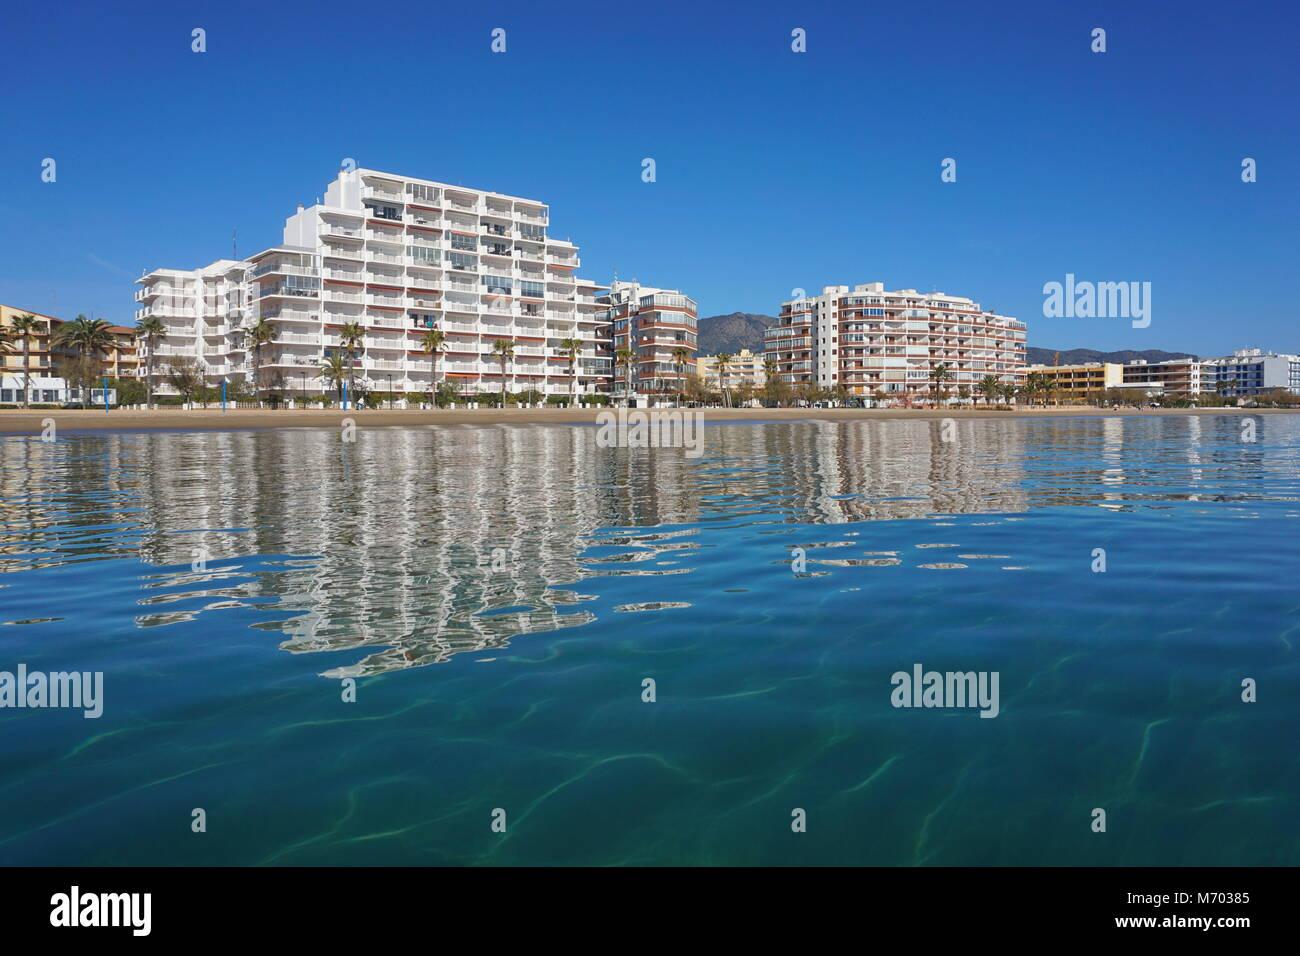 Spain Costa Brava apartment buildings along the beach, Mediterranean sea, Santa Margarida, Roses, Catalonia, Girona - Stock Image